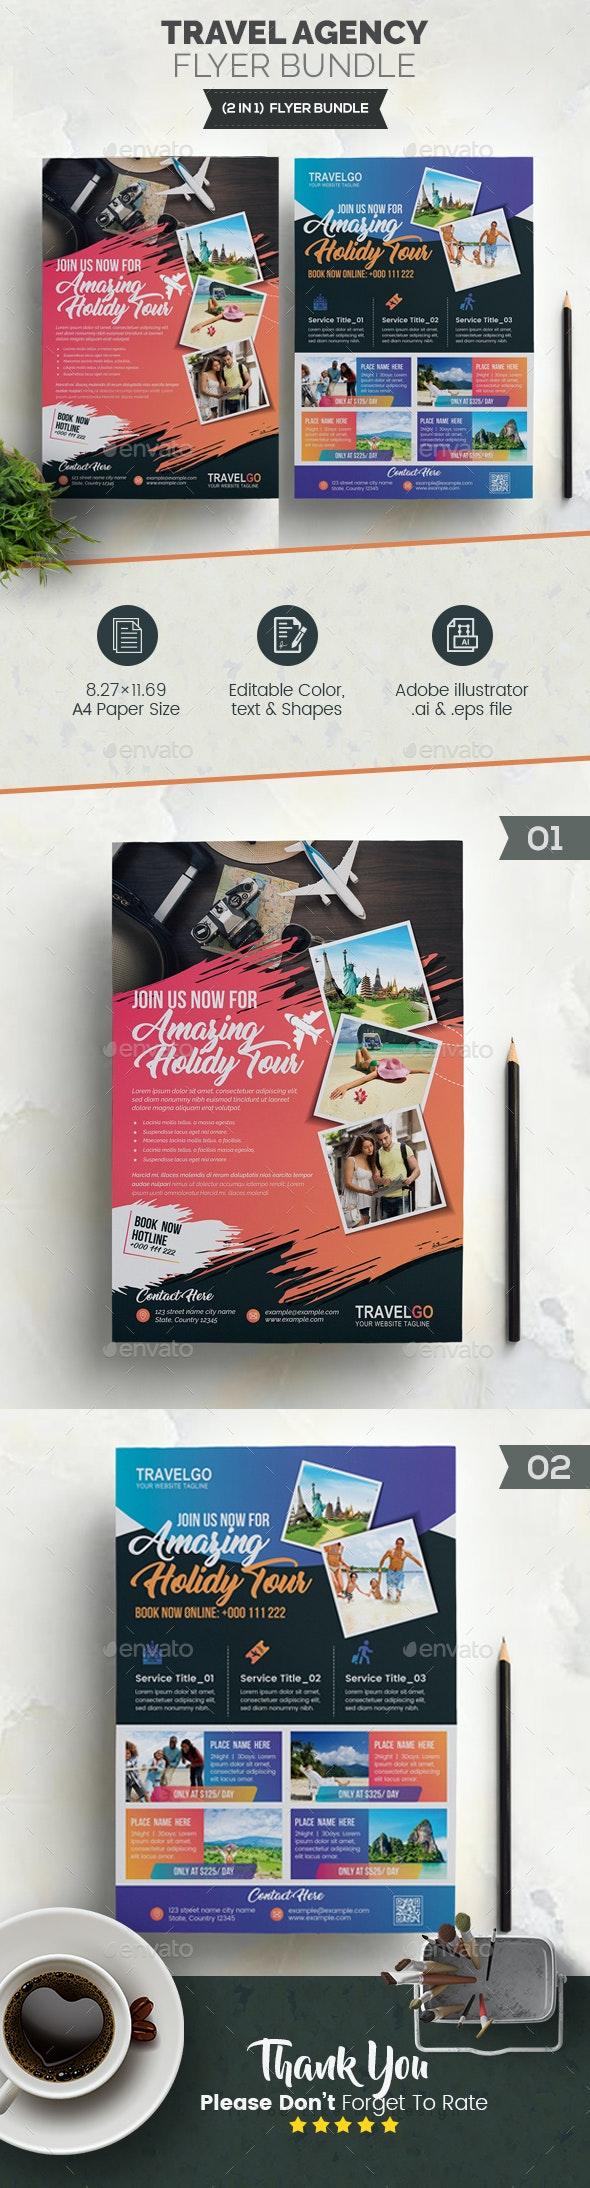 Travel Agency Flyer Bundle 2 in 1 - Corporate Flyers